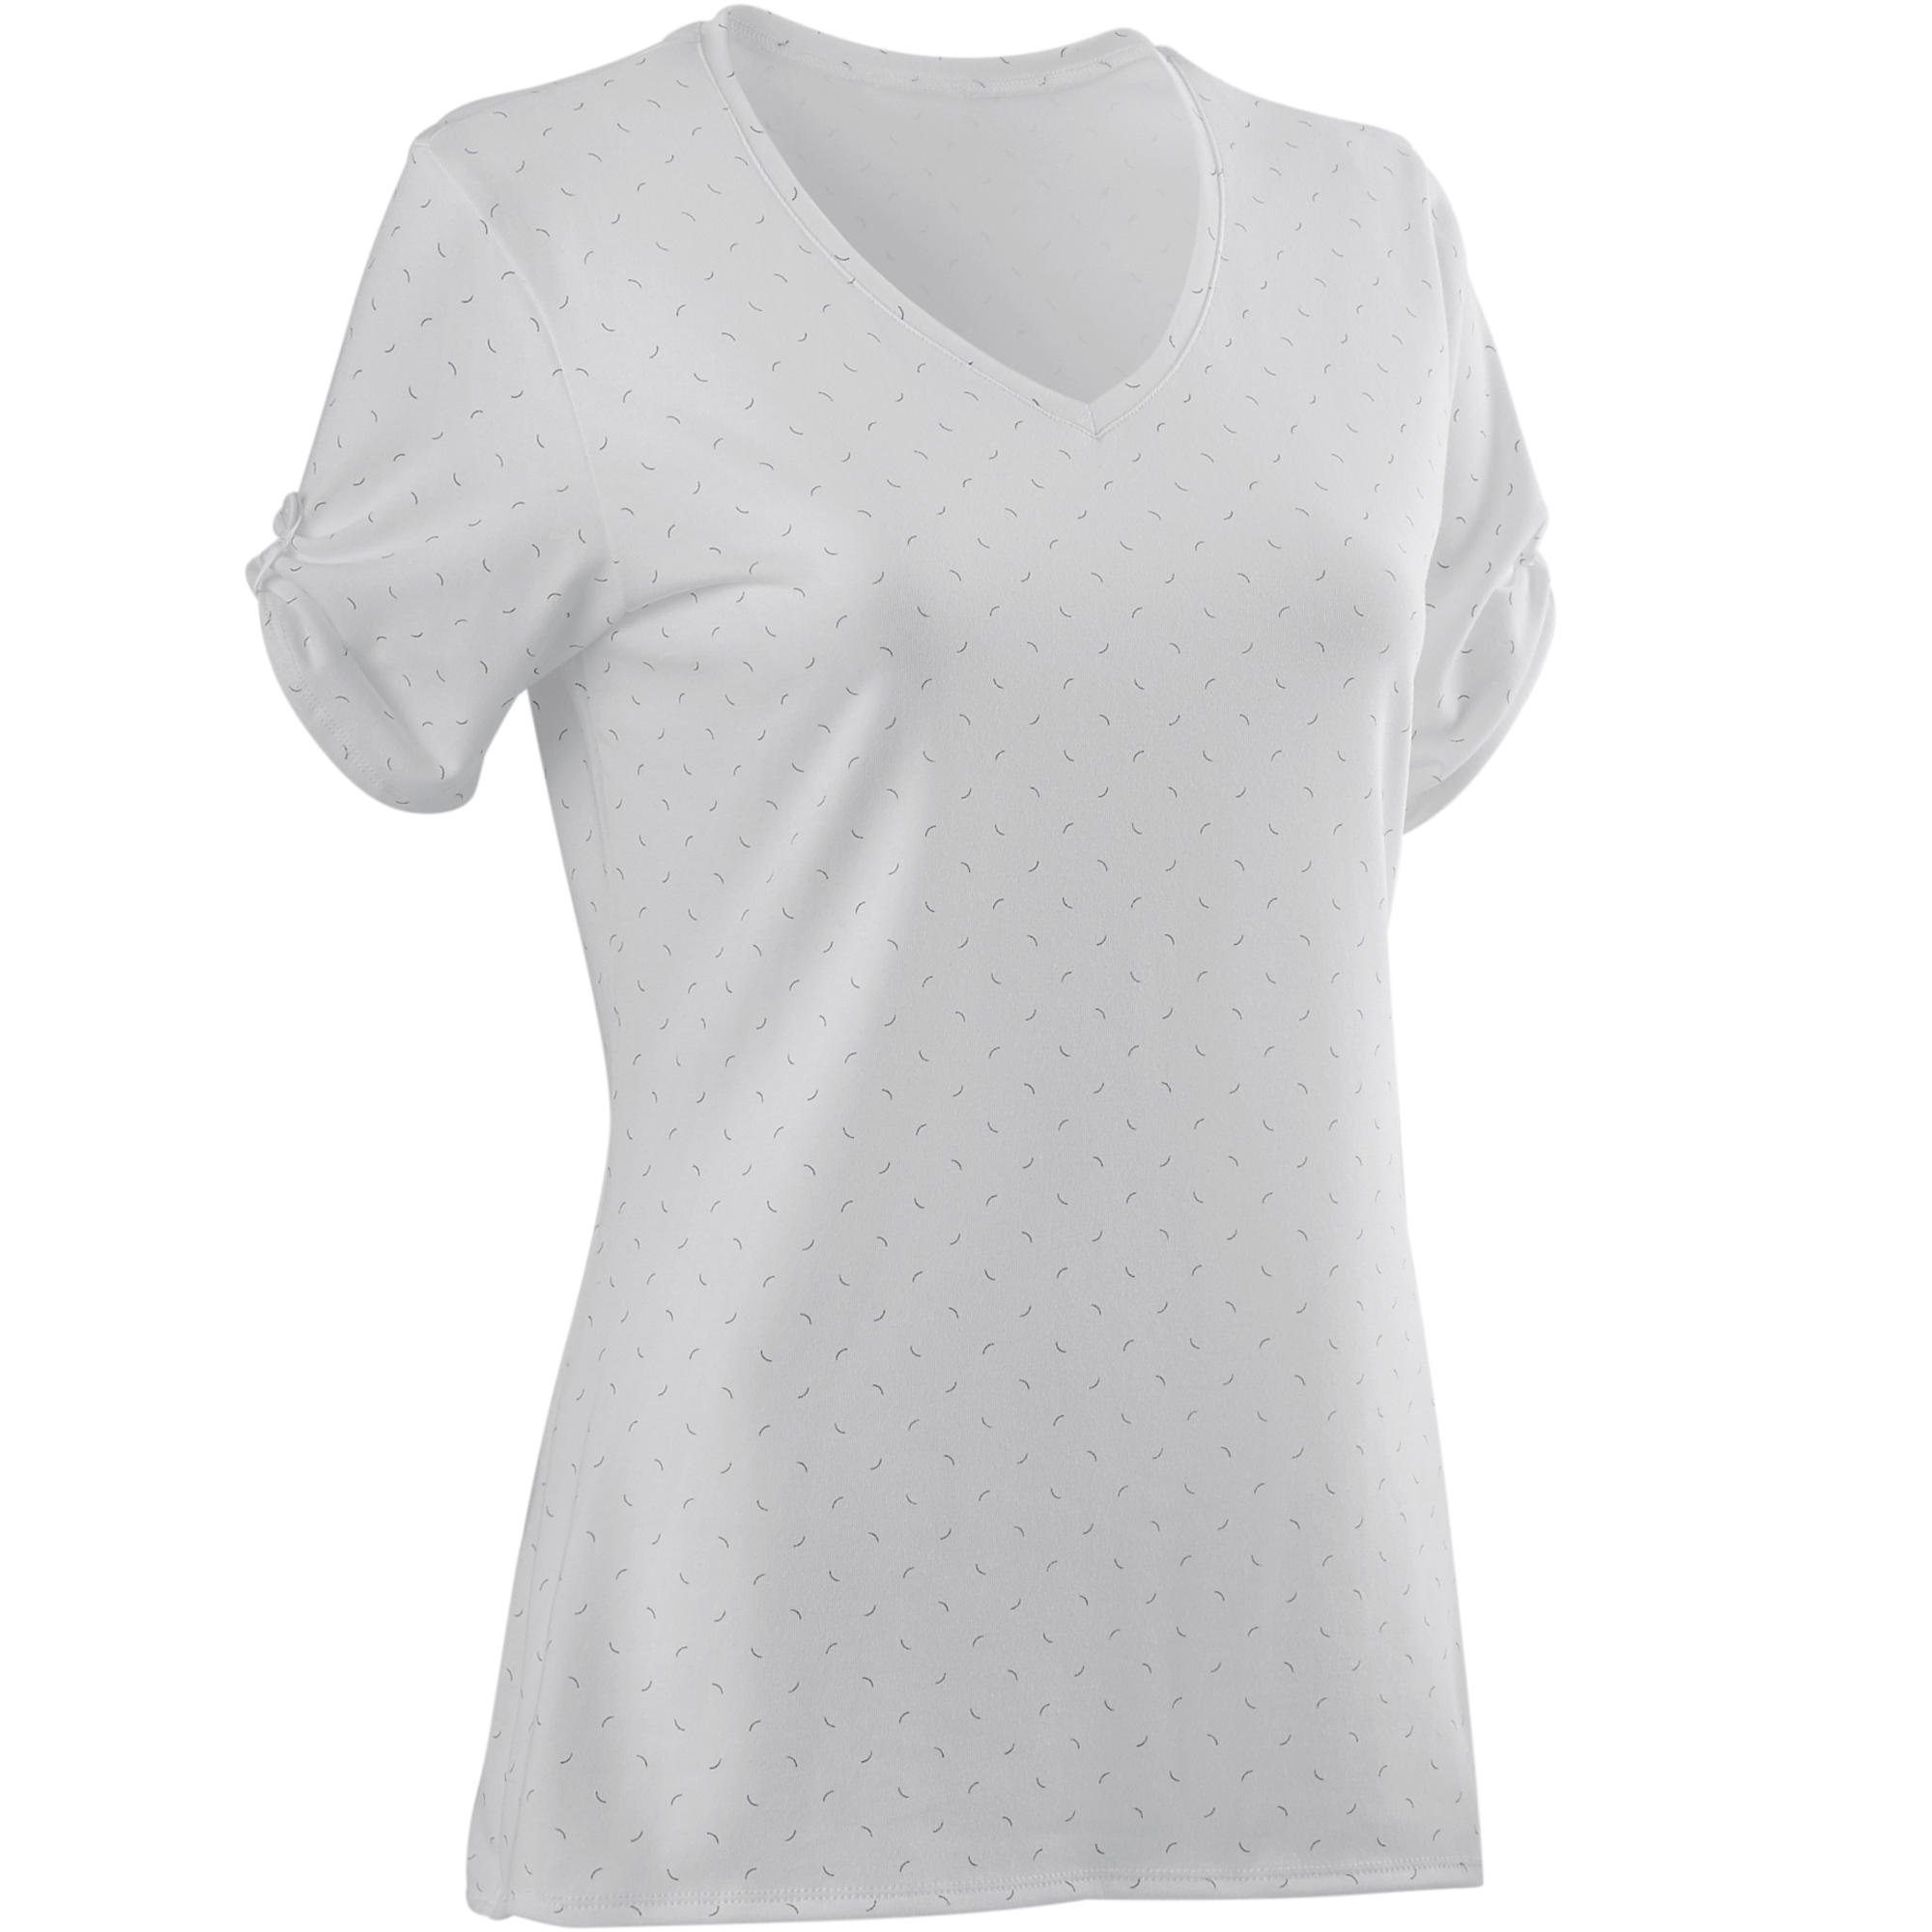 Camiseta 510 Pilates y Gimnasia suave mujer blanco estampado